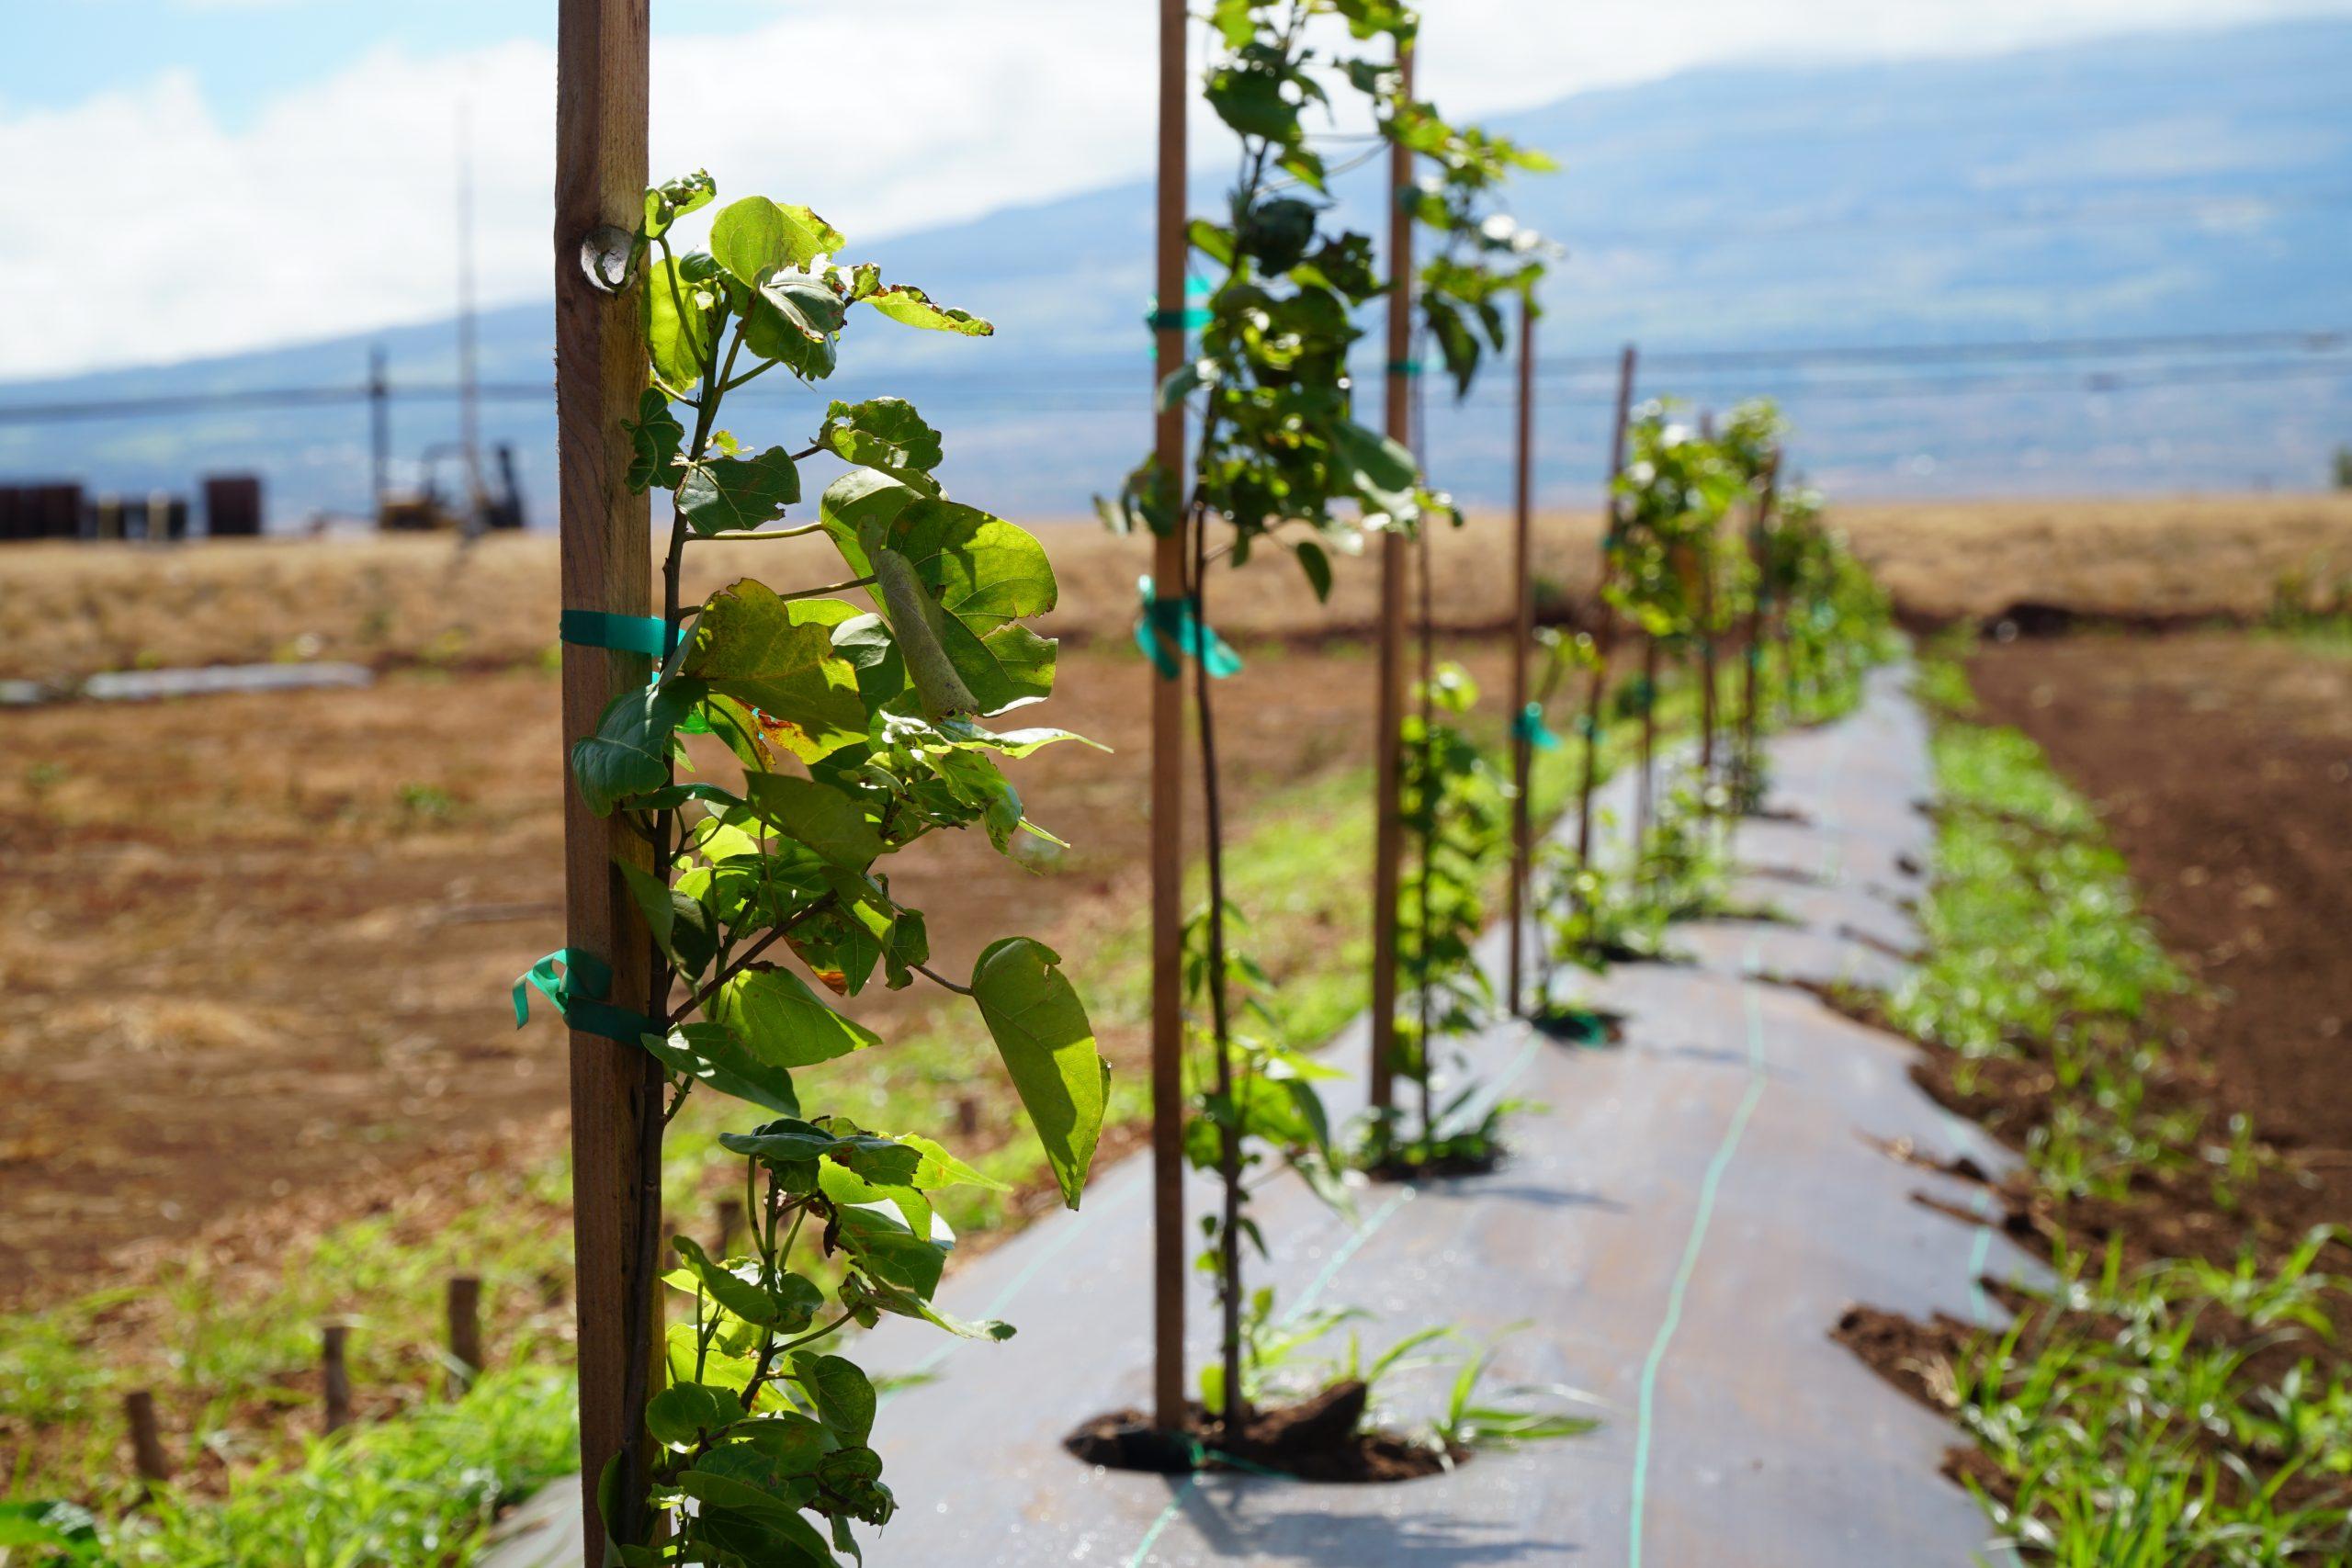 Mahi Pono Seeking Volunteers for Statewide Tree Planting Day with ReTree Hawaiʻi